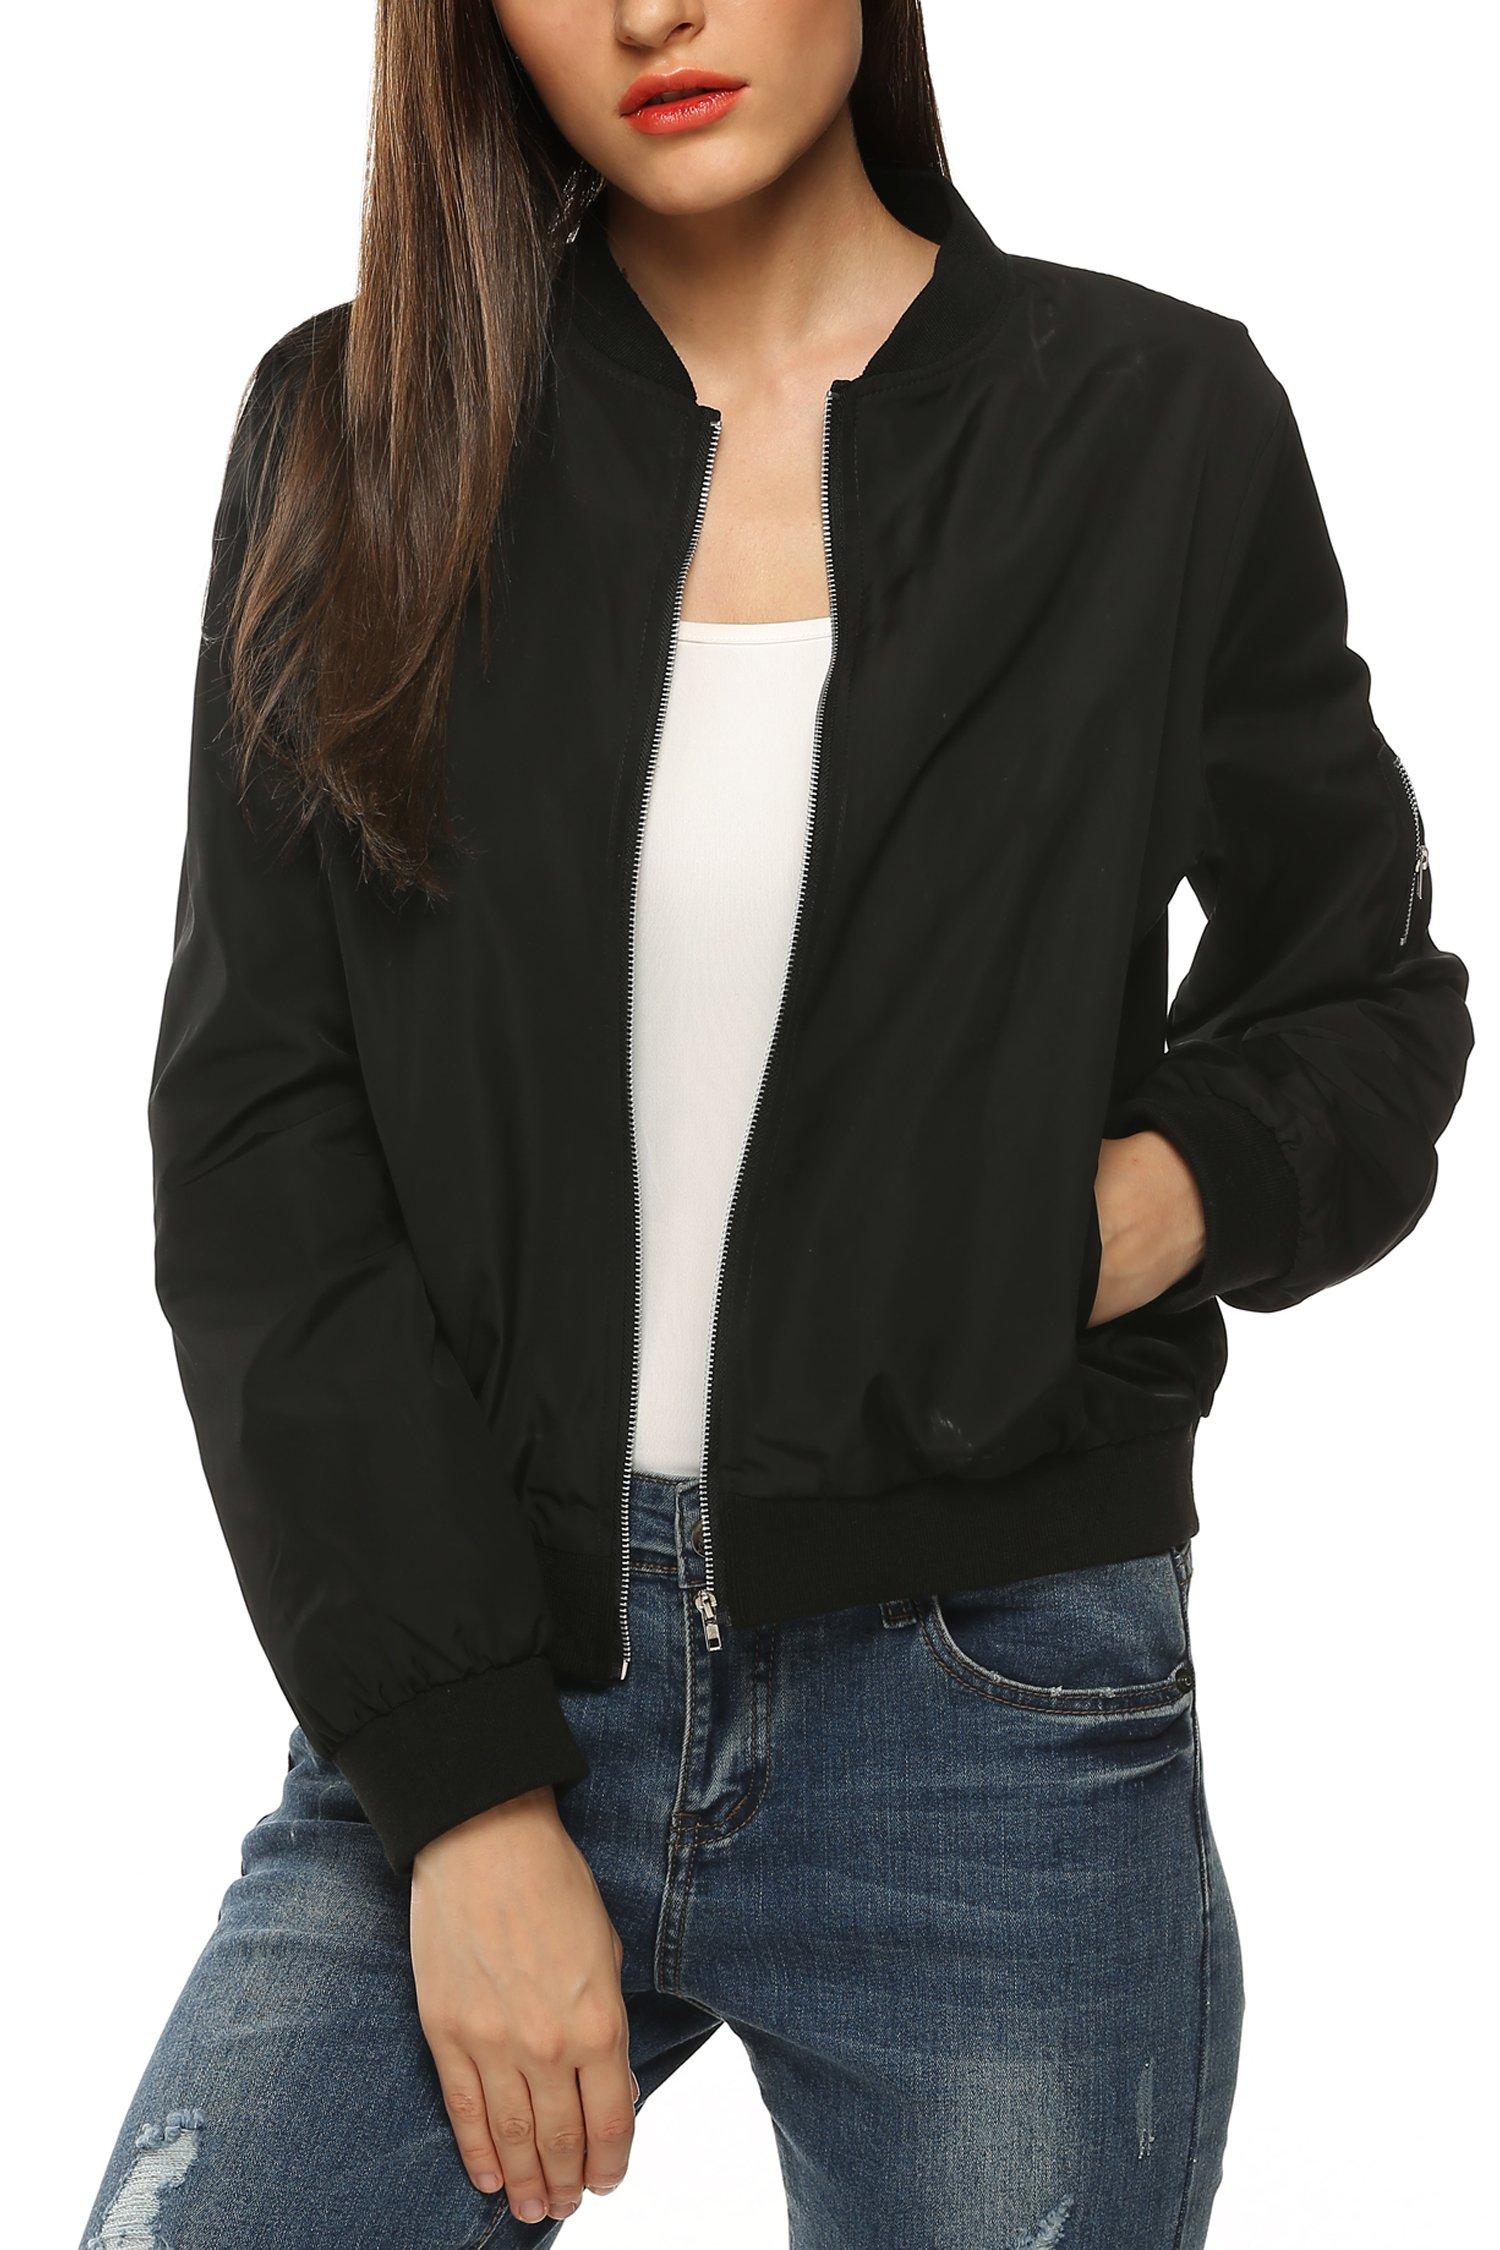 Zeagoo Womens Classic Quilted Jacket Short Bomber Jacket Coat, Black, Medium by Zeagoo